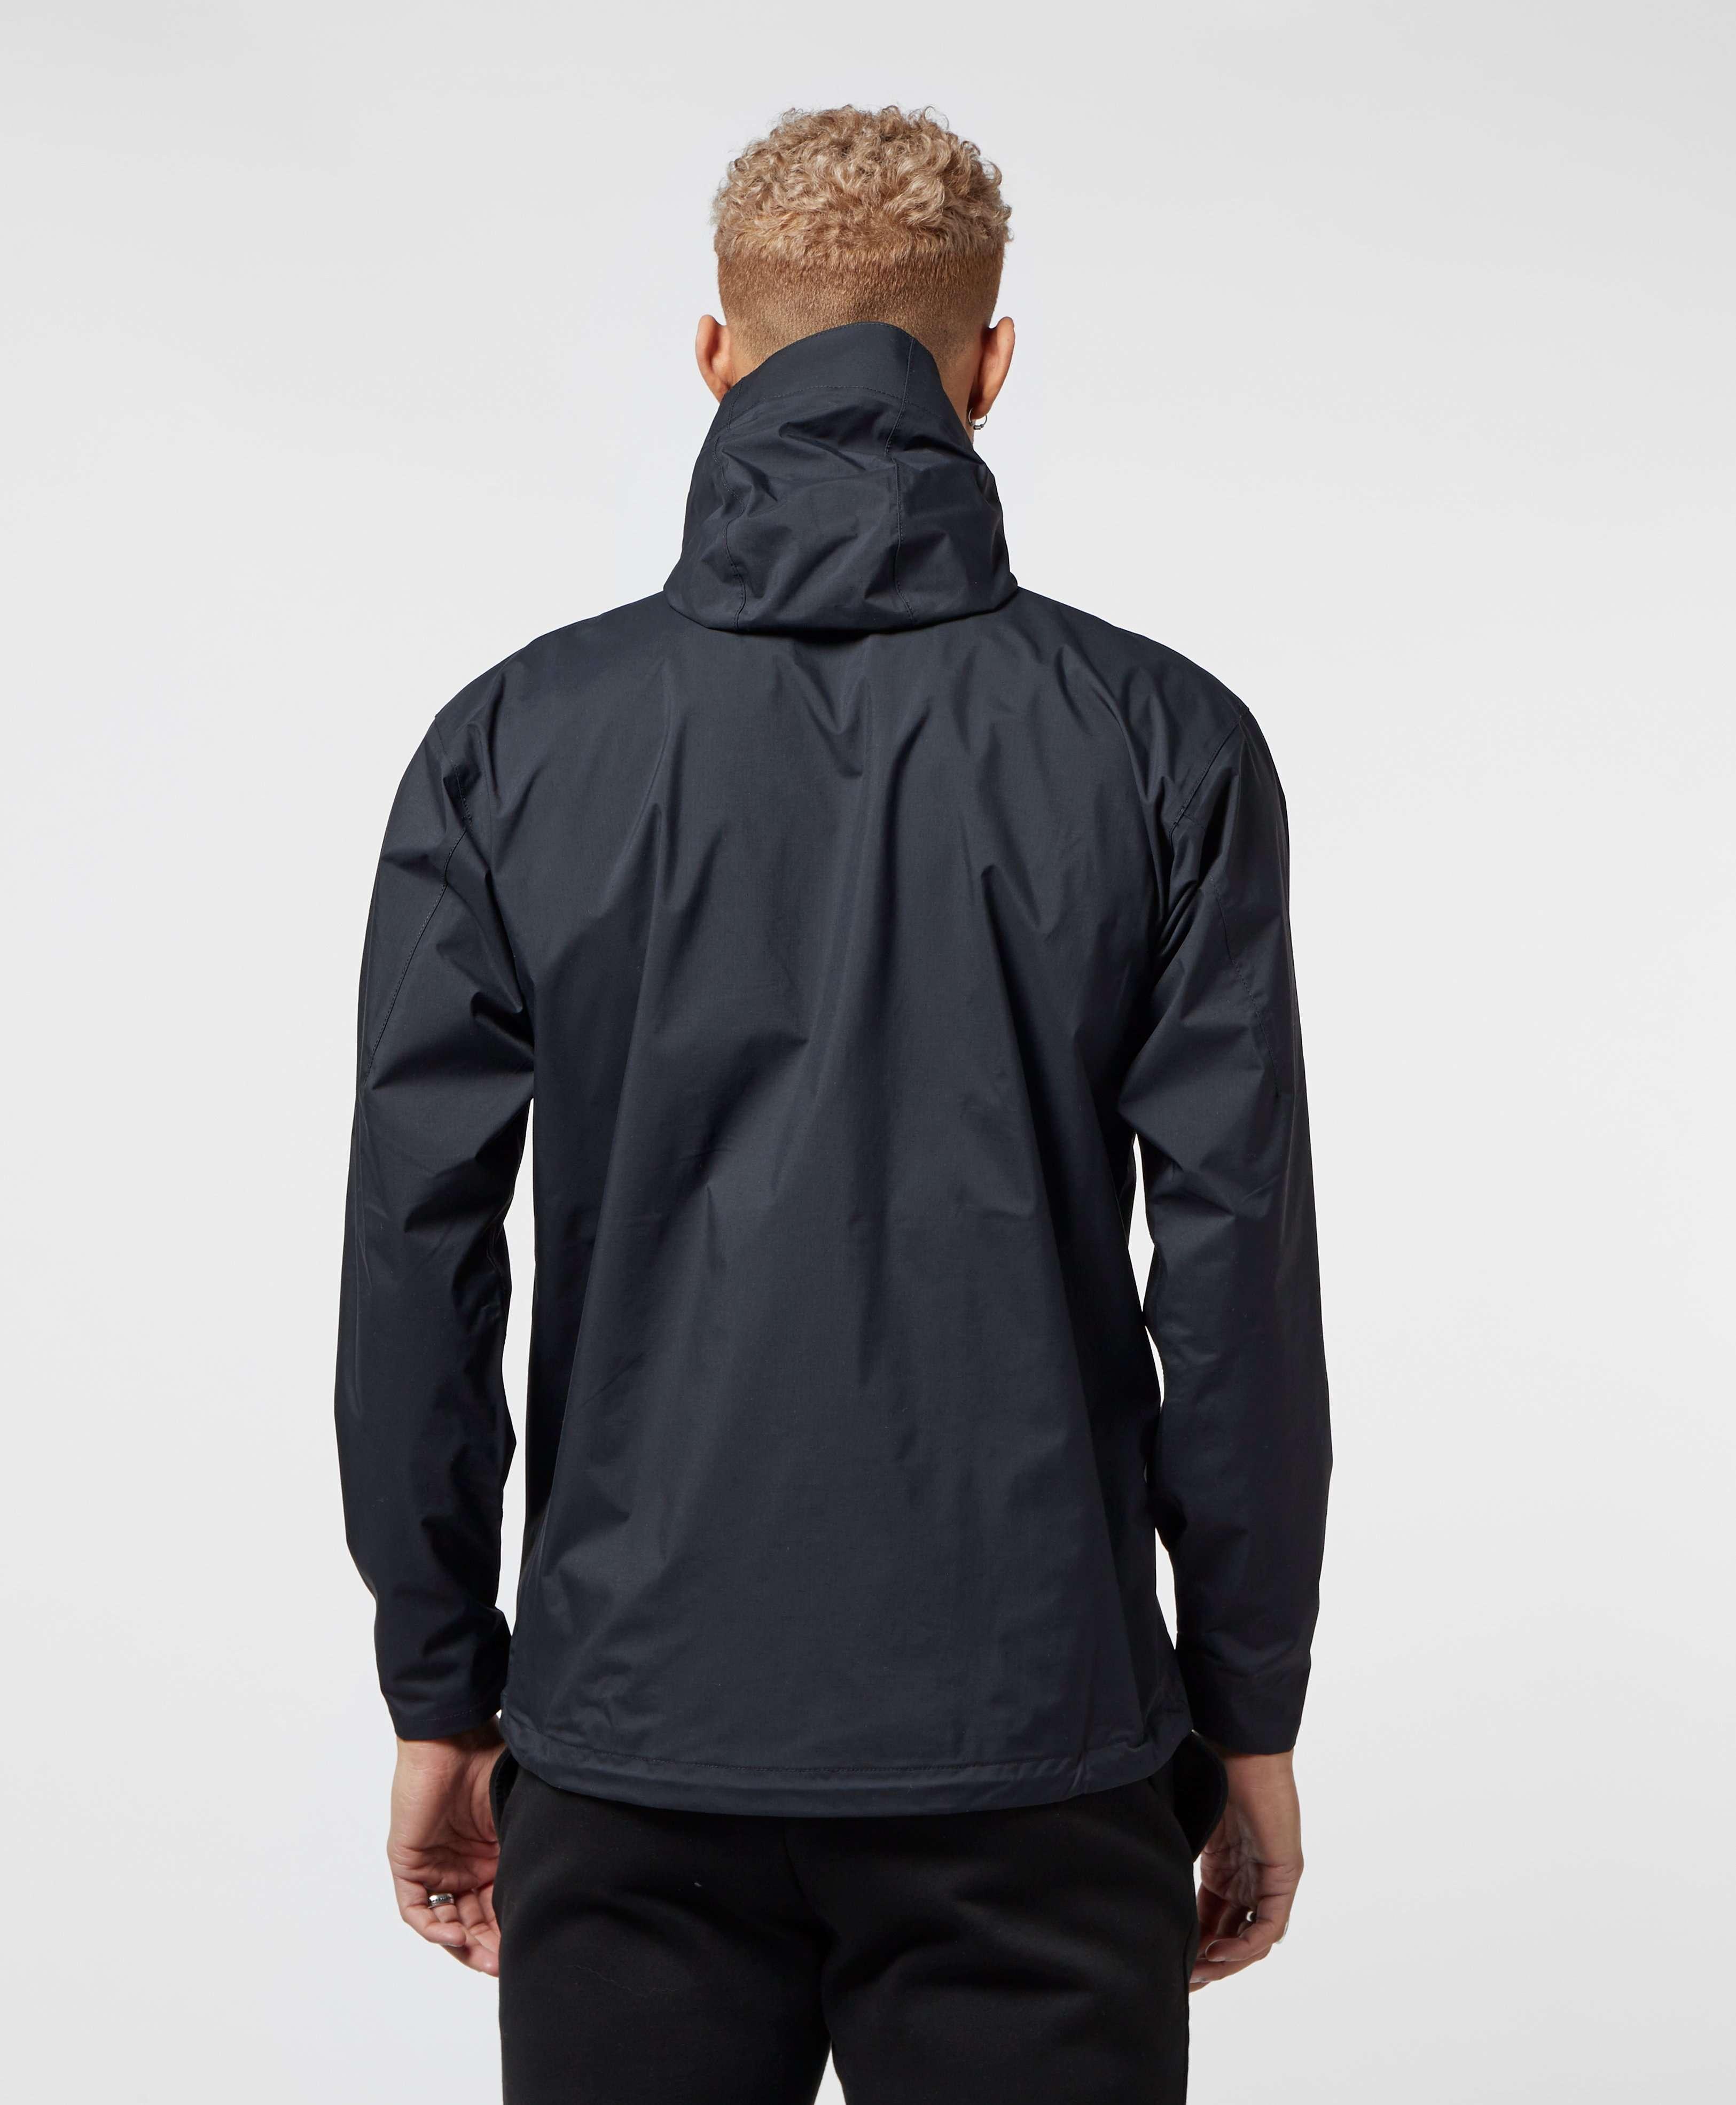 Berghaus Deluge Pro Lightweight Waterproof Shell Jacket